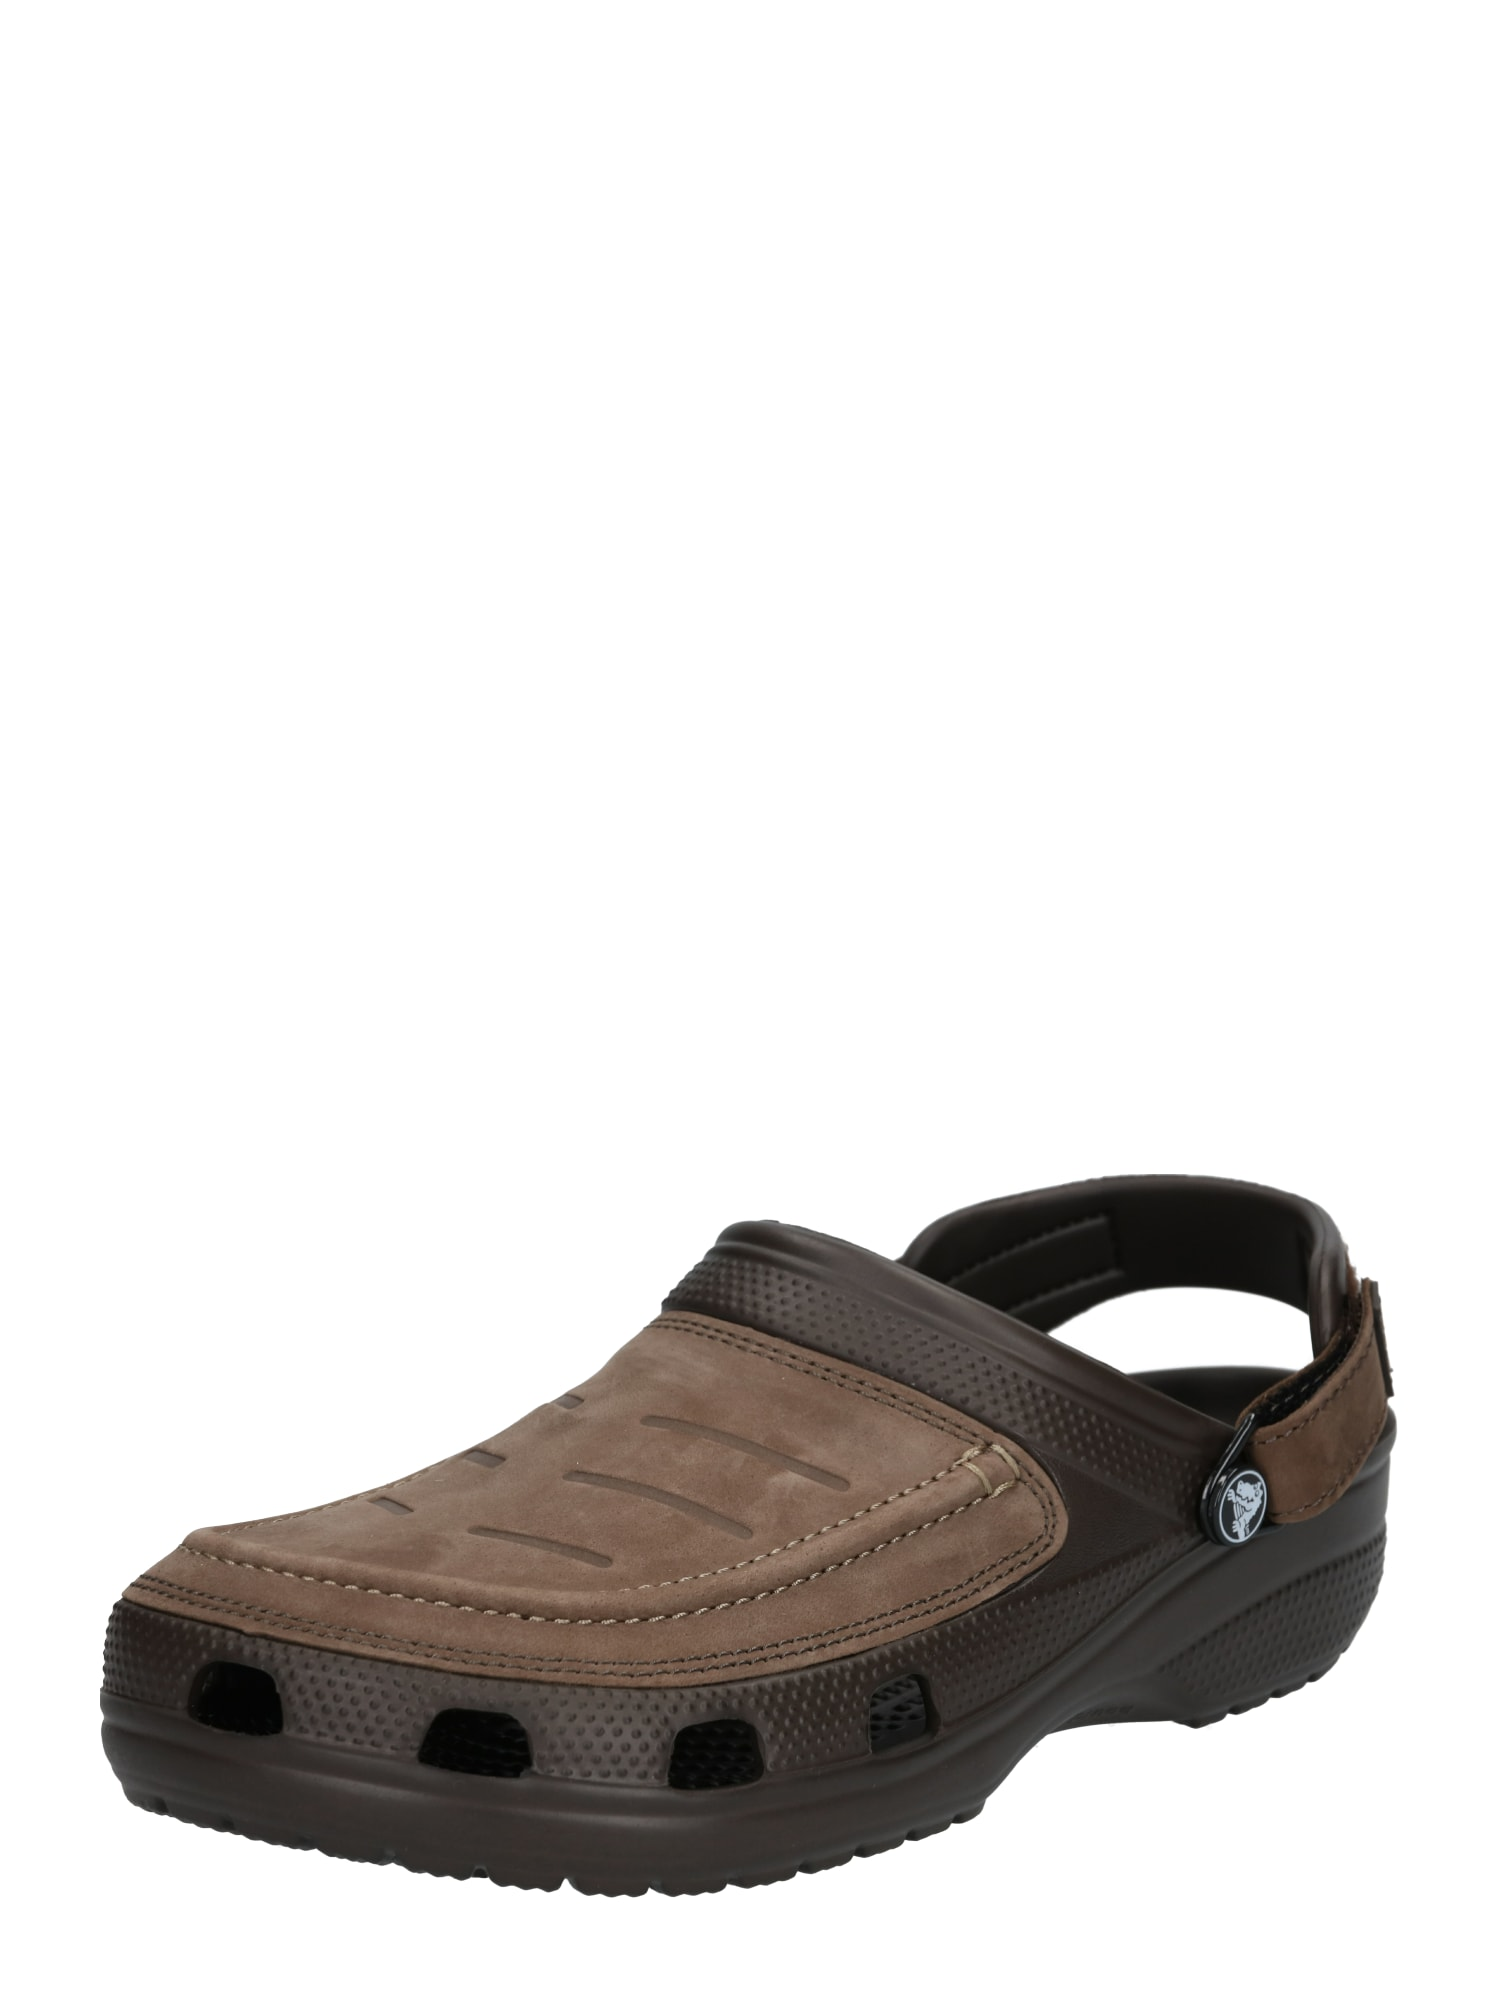 Pantofle Yukon Vista mokka Crocs